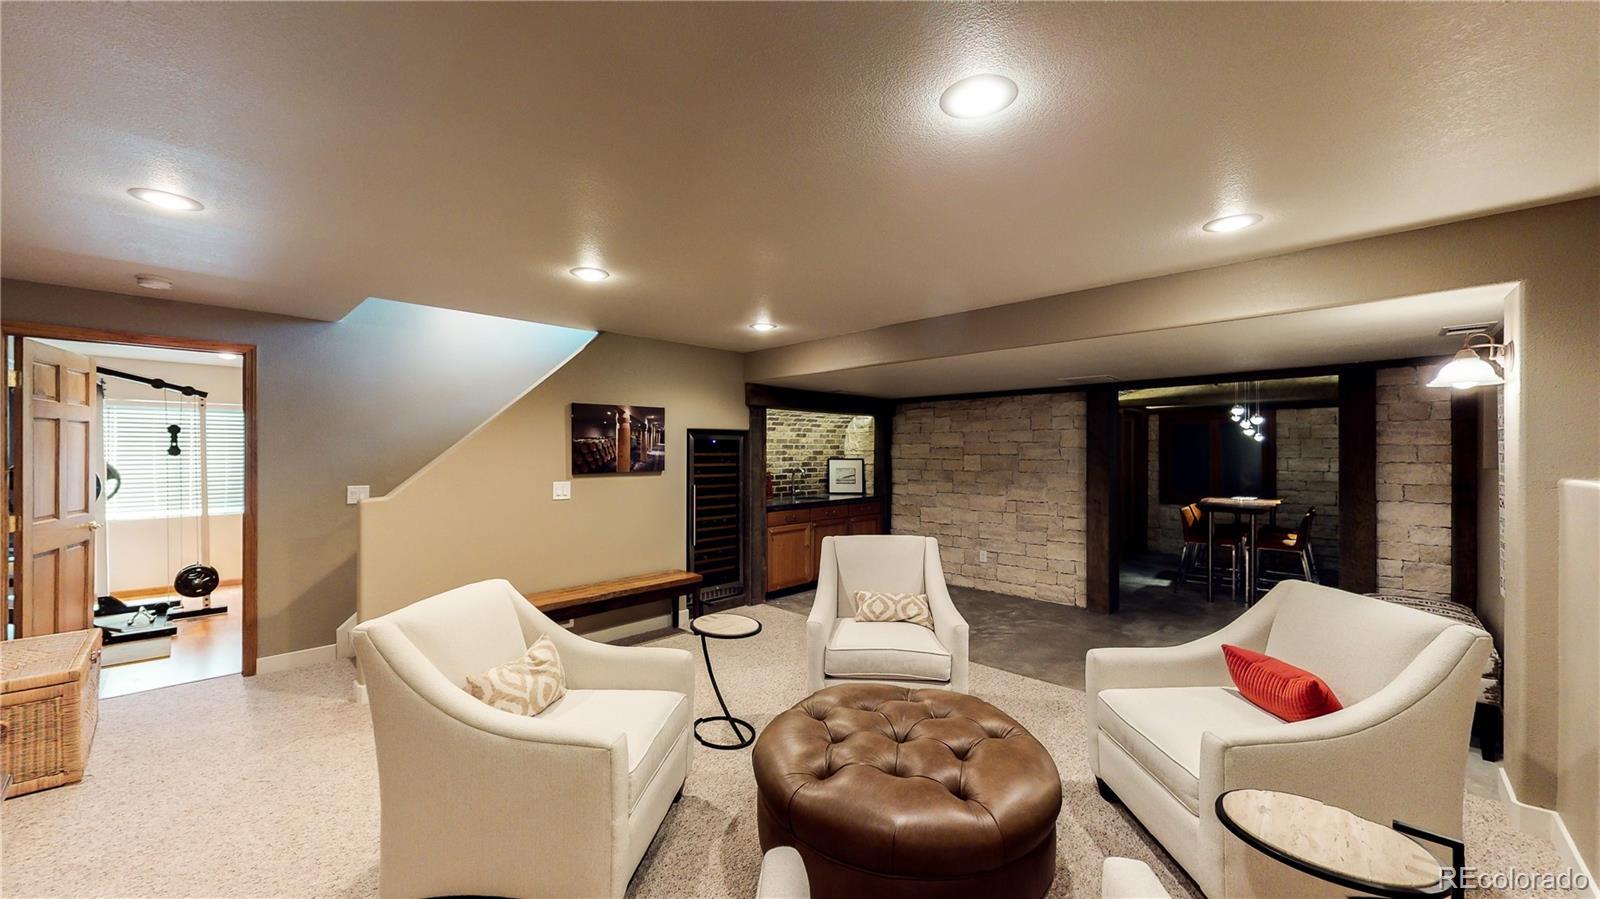 MLS# 9424893 - 30 - 2174 Terrace Drive, Highlands Ranch, CO 80126